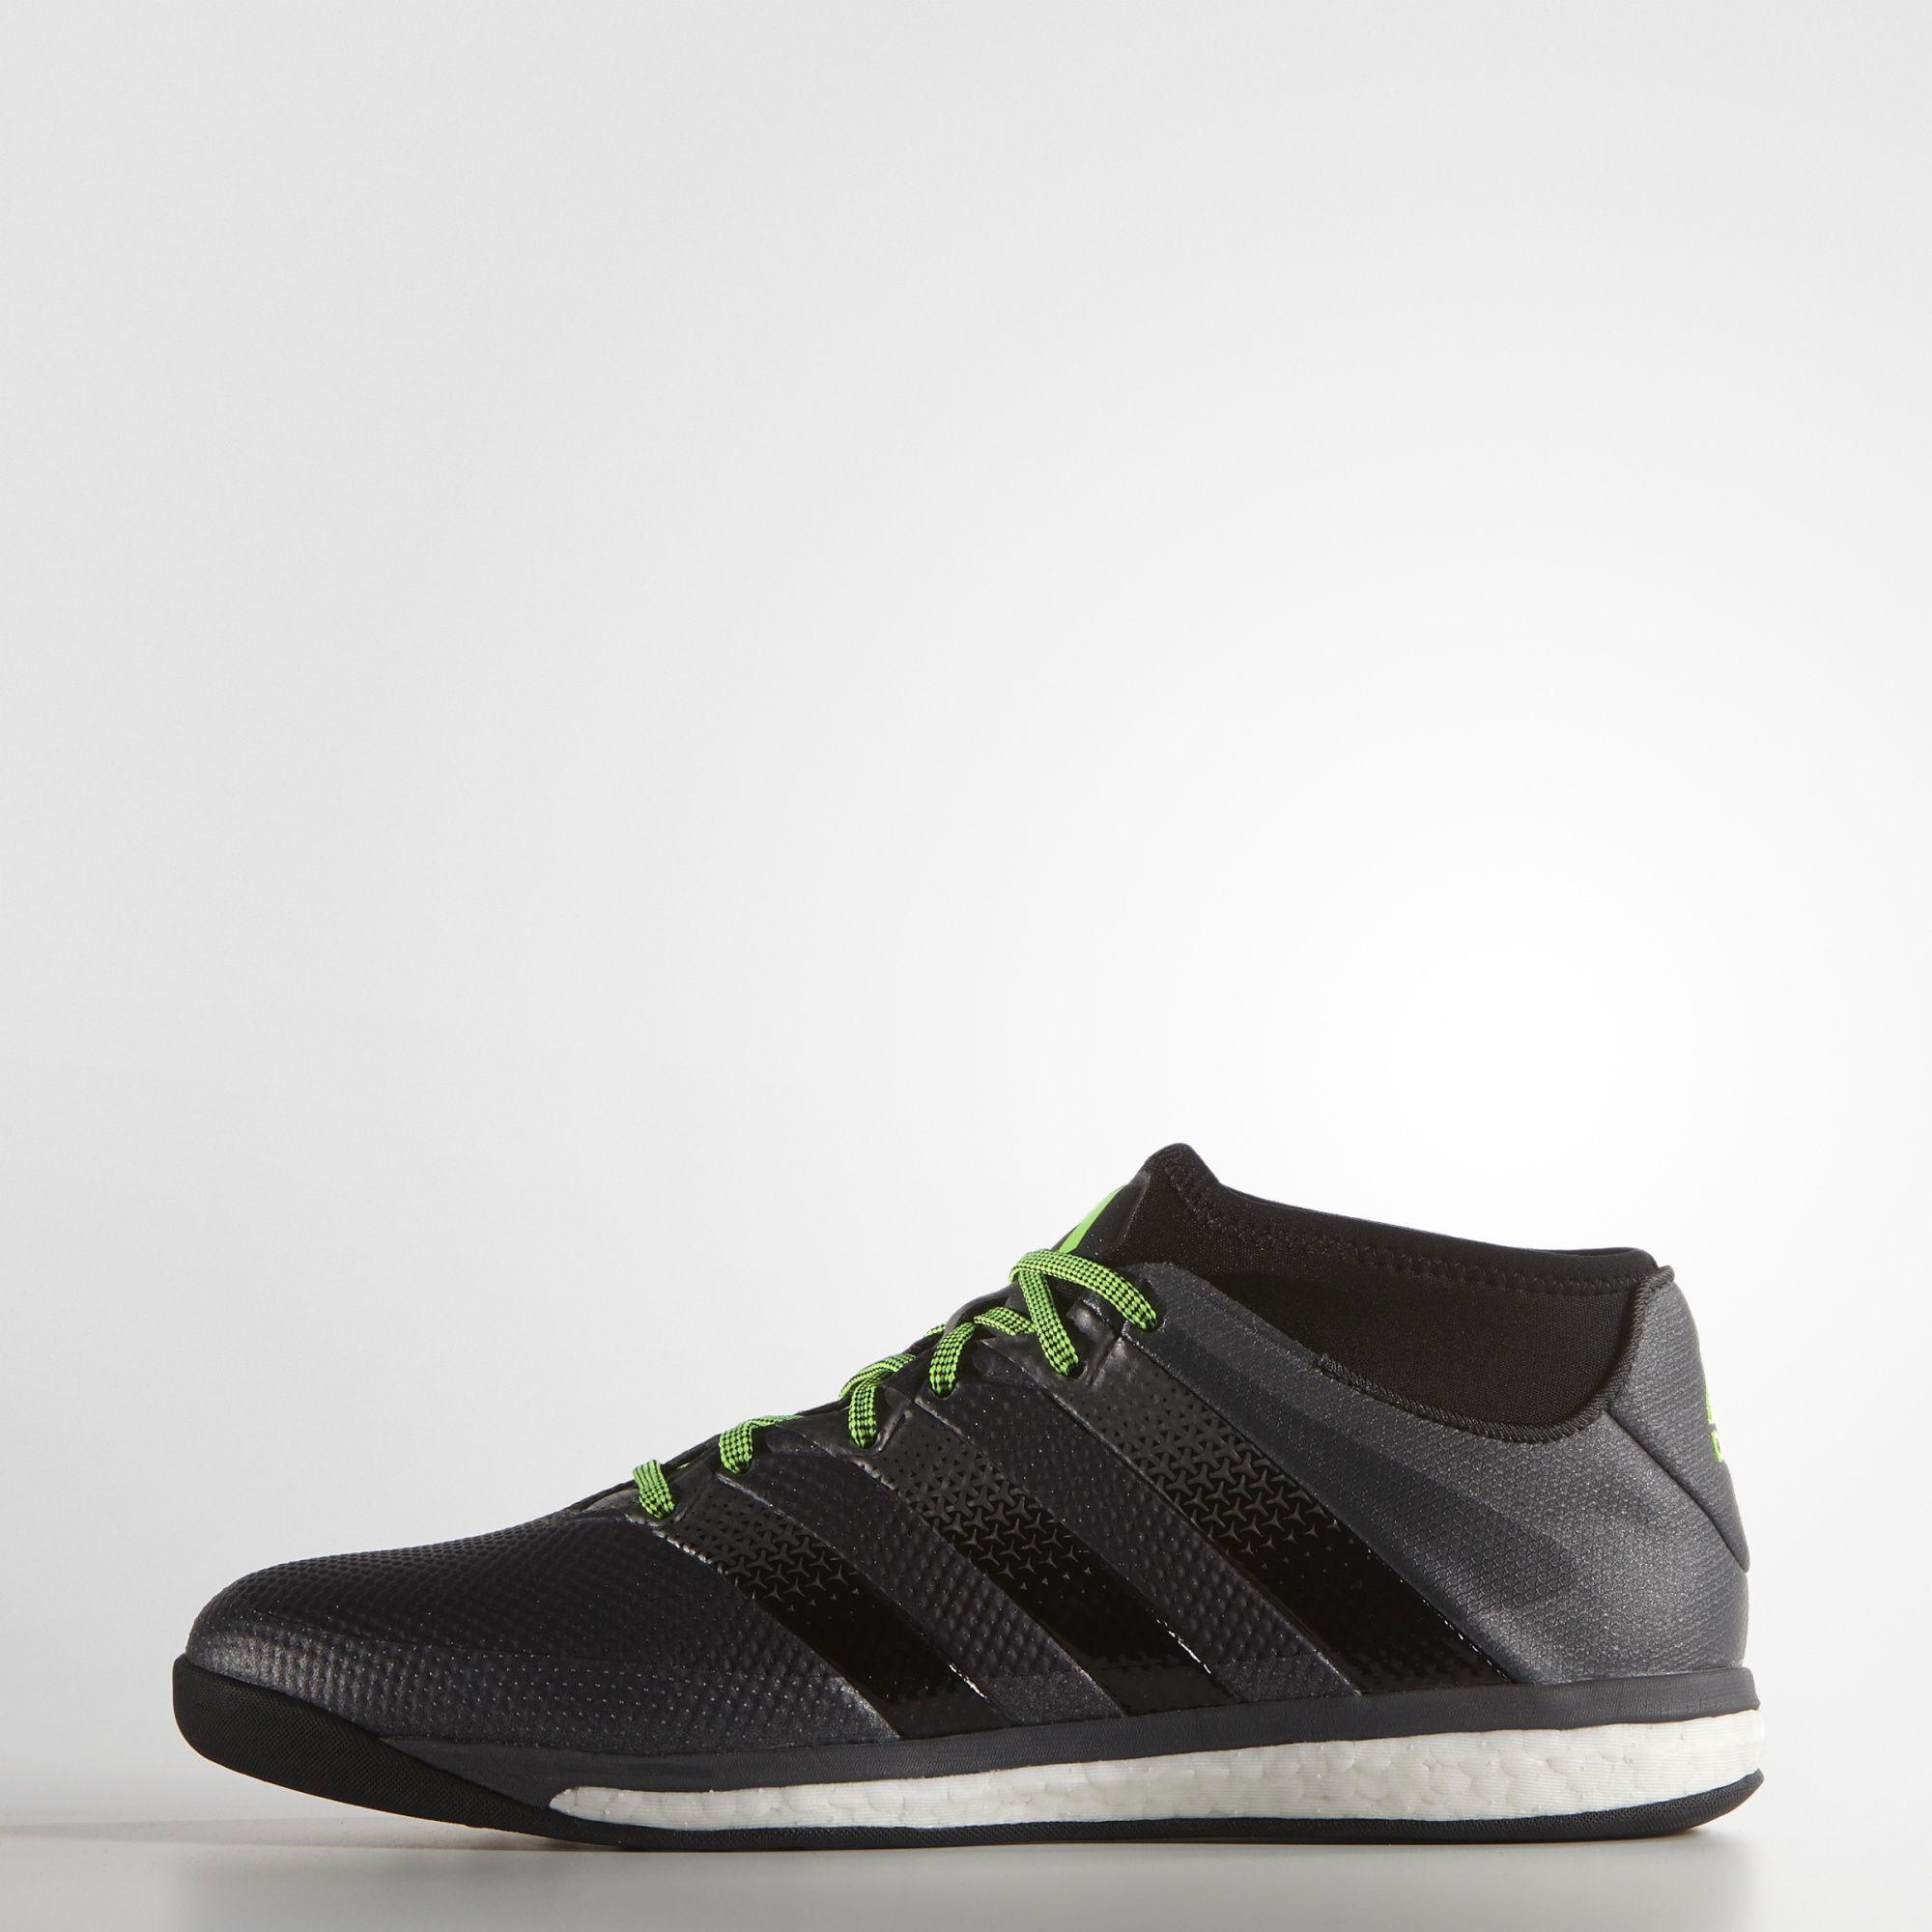 d4dfc7d0c419 inexpensive adidas ace 16.1 primeknit fg men grey x1255 6d2ce 1c2ec  sweden adidas  ace 16.1 street black grey f7815 5afcb